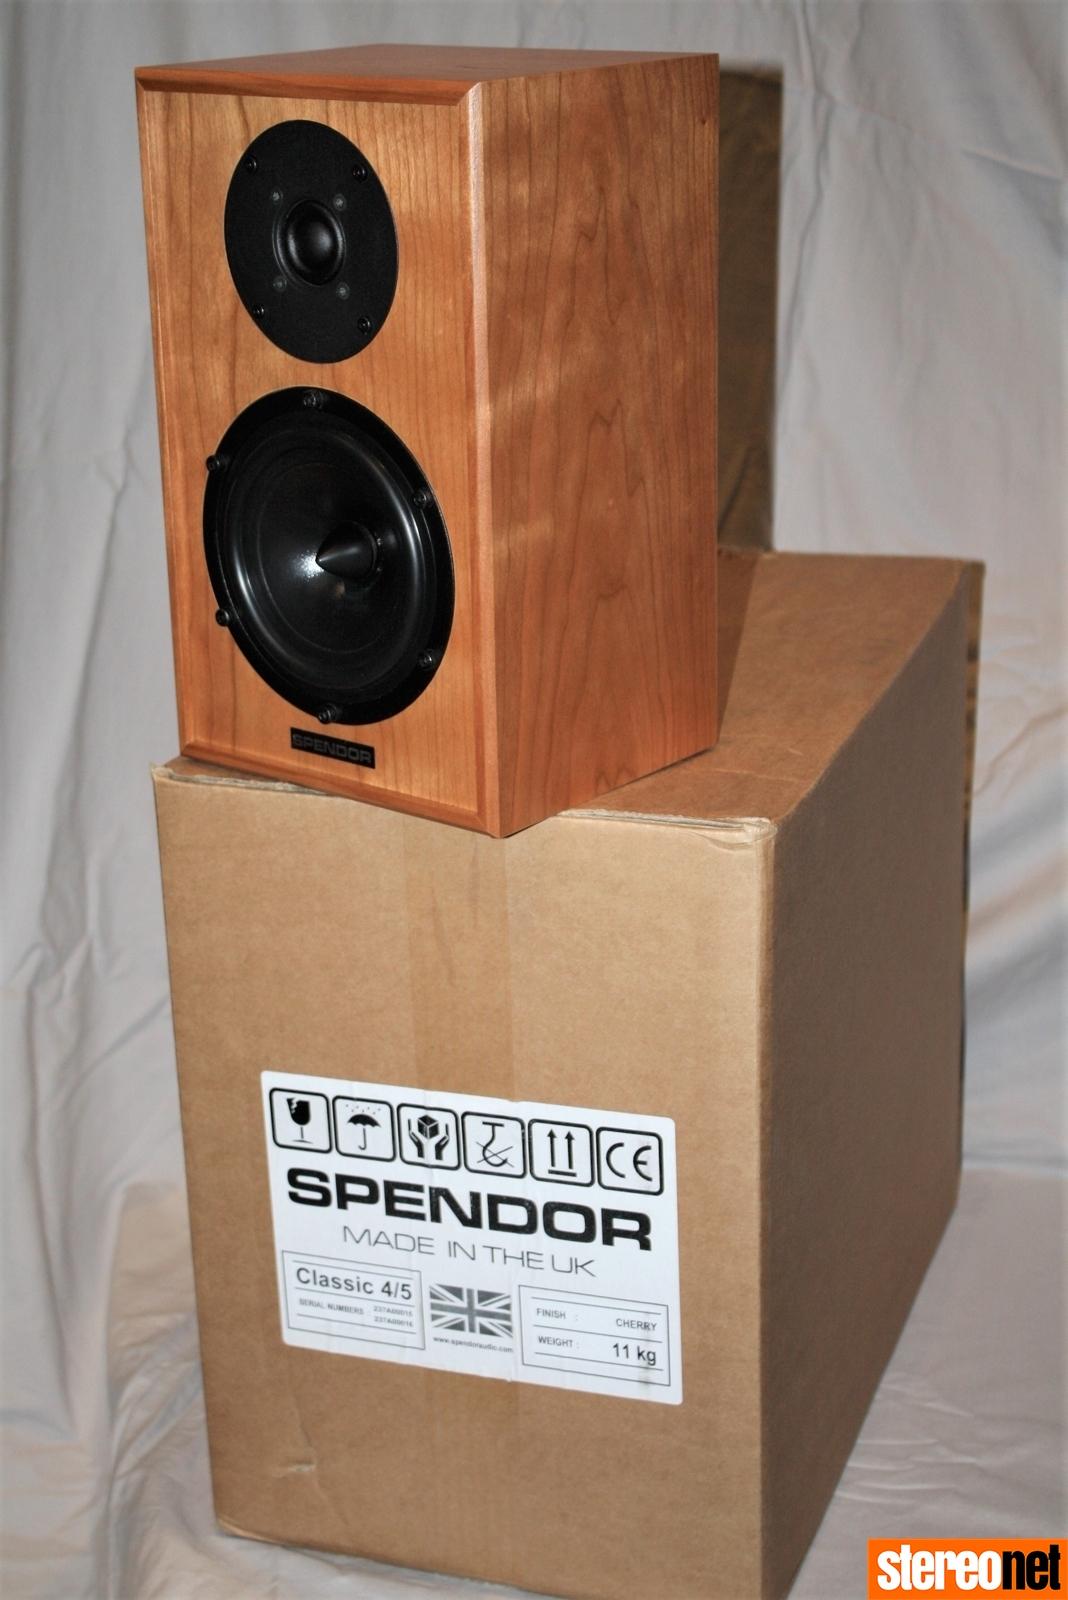 Spendor Classic 4/5 review